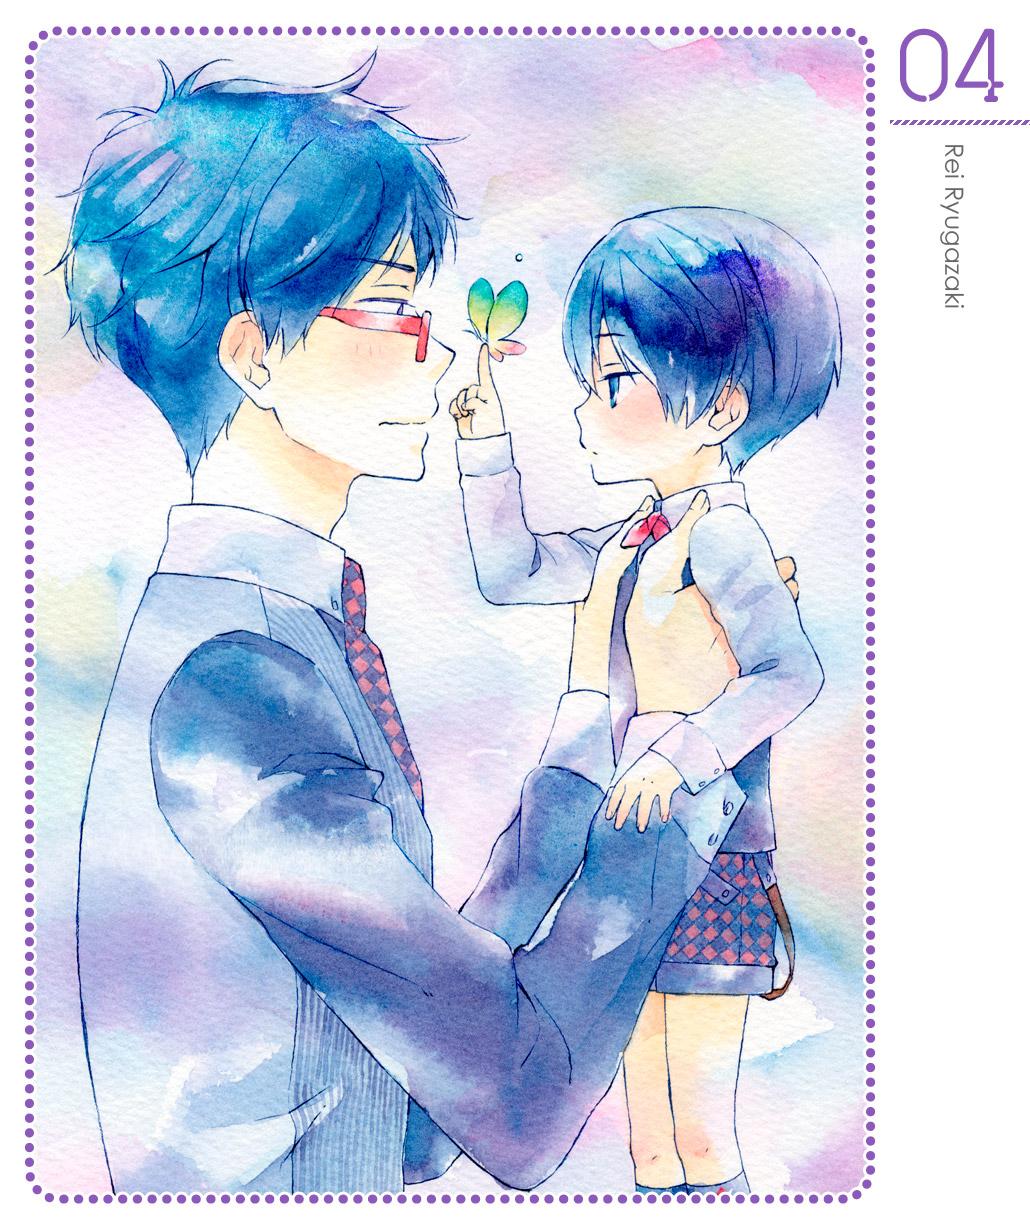 Page 12 Of 64 Zerochan Anime Image Board: Watercolor - Traditional Media